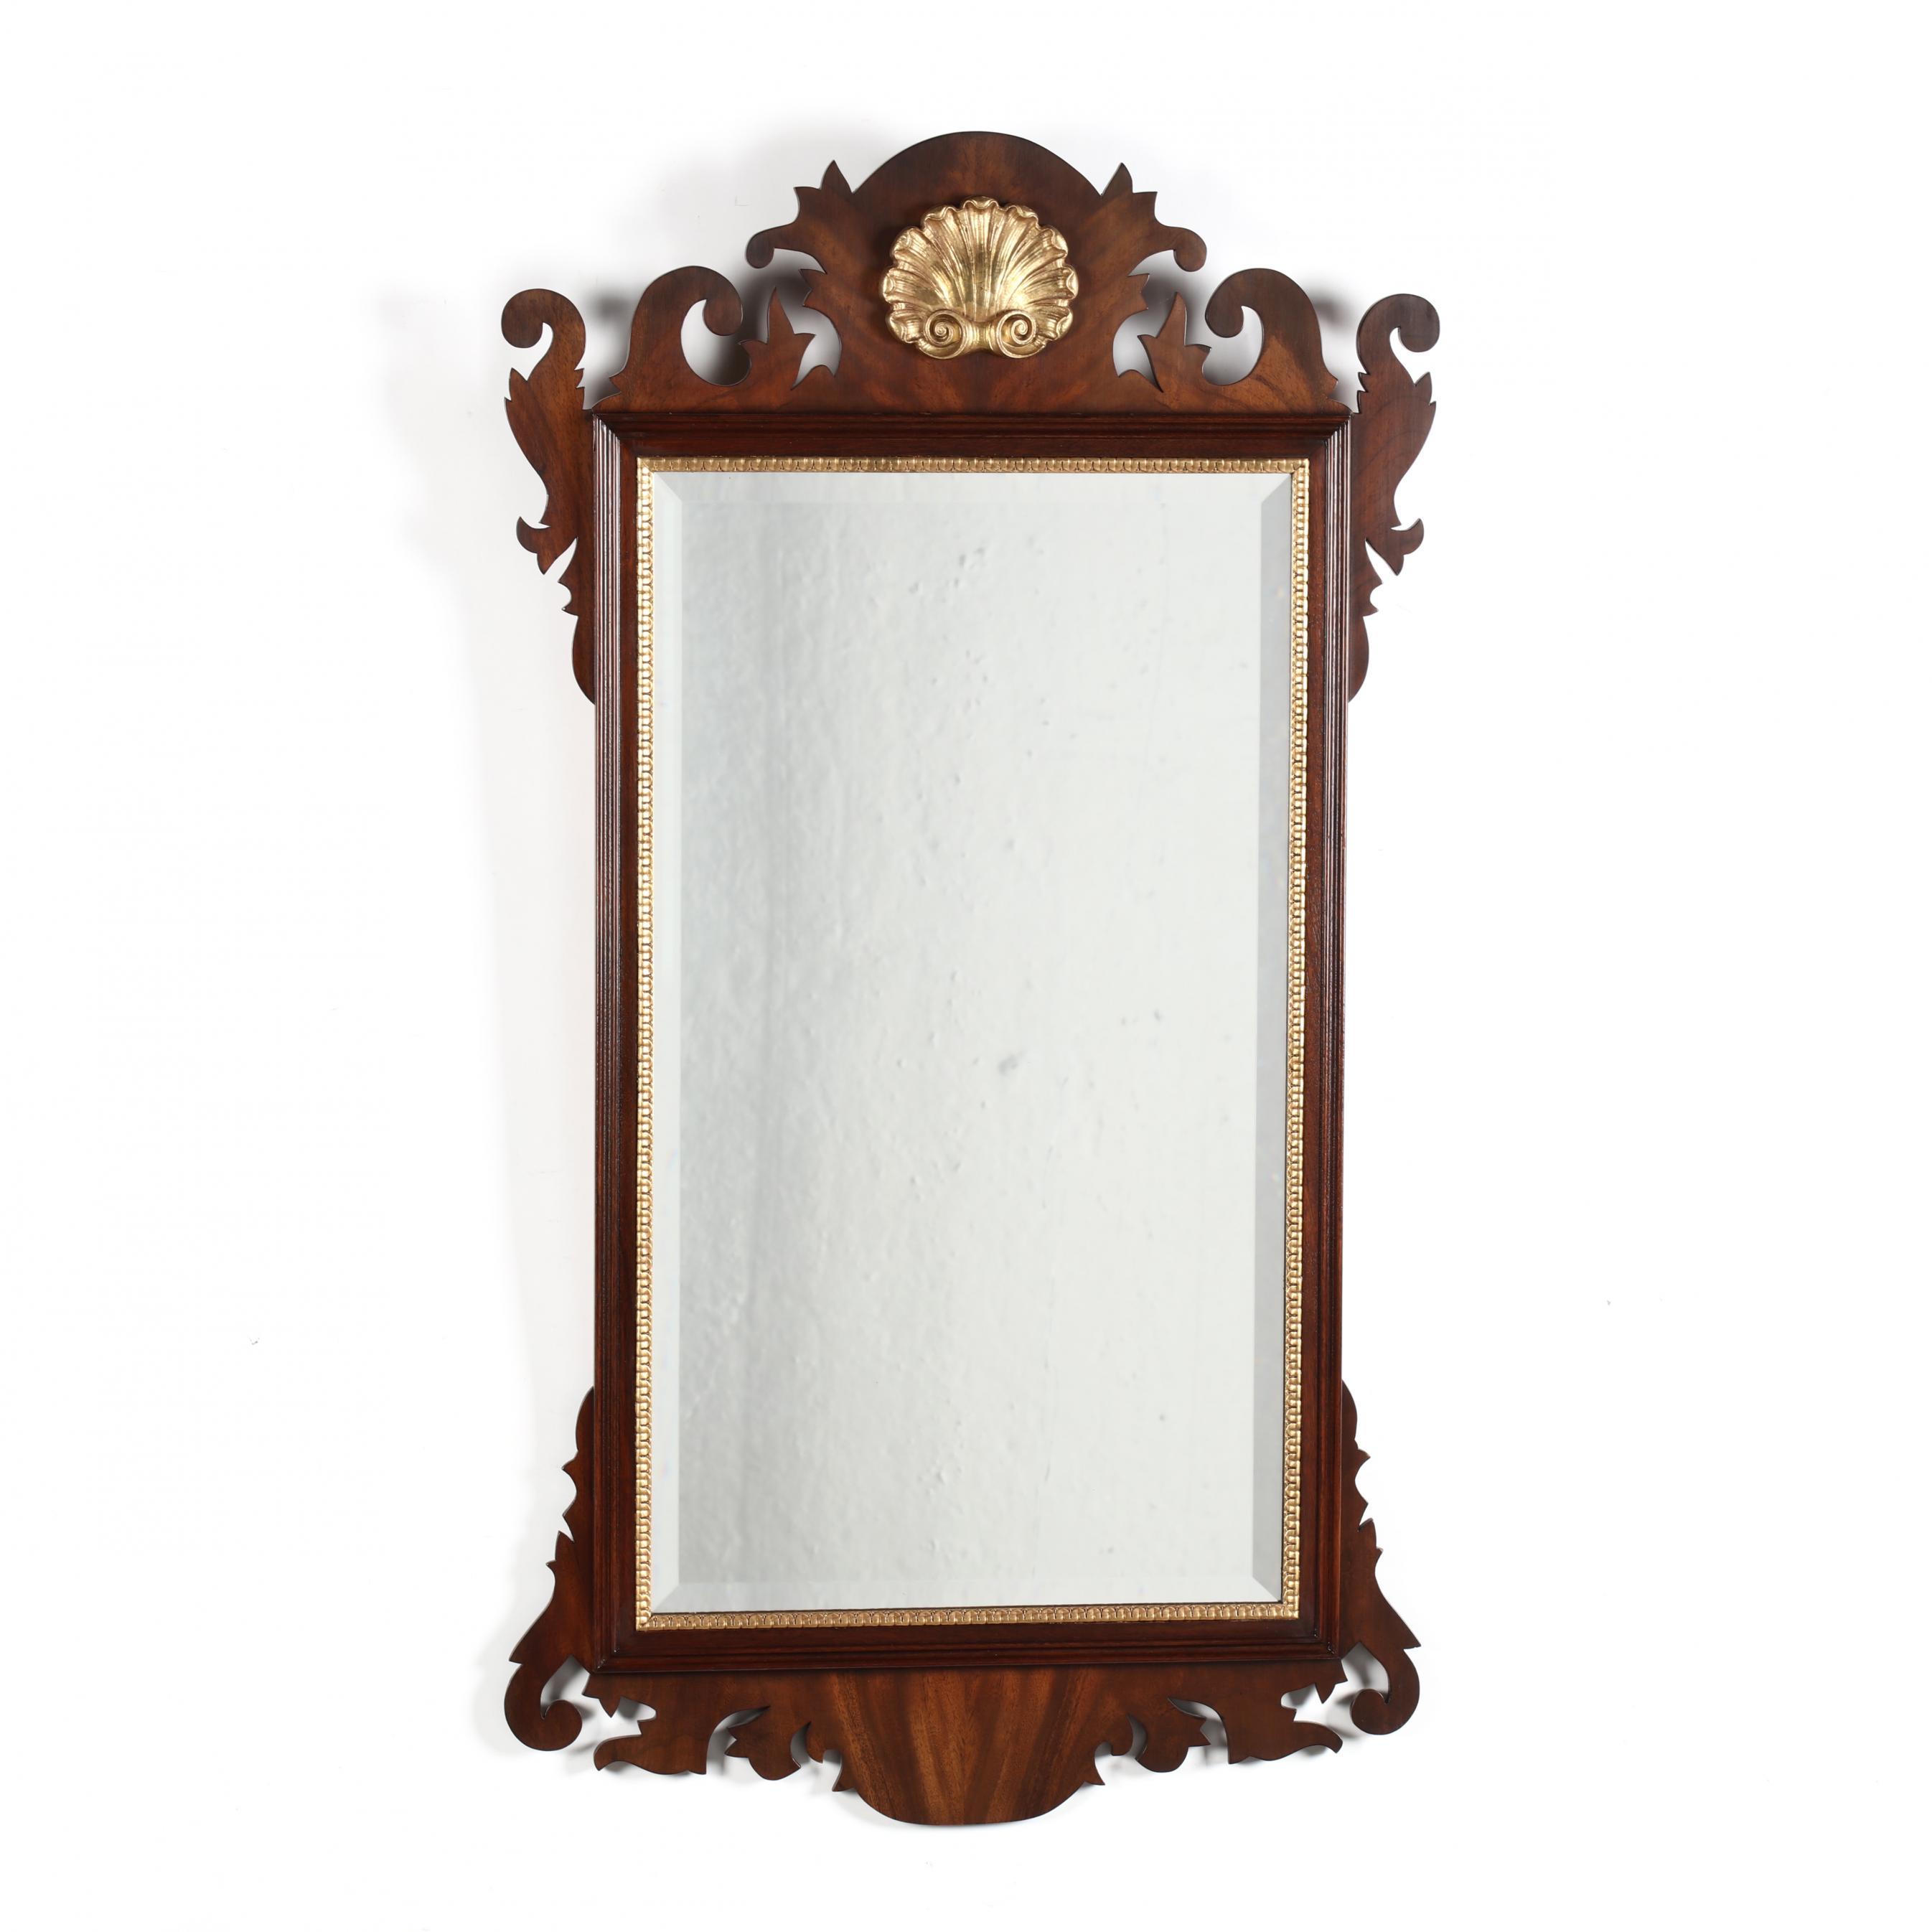 henkel-harris-chippendale-style-mahogany-mirror